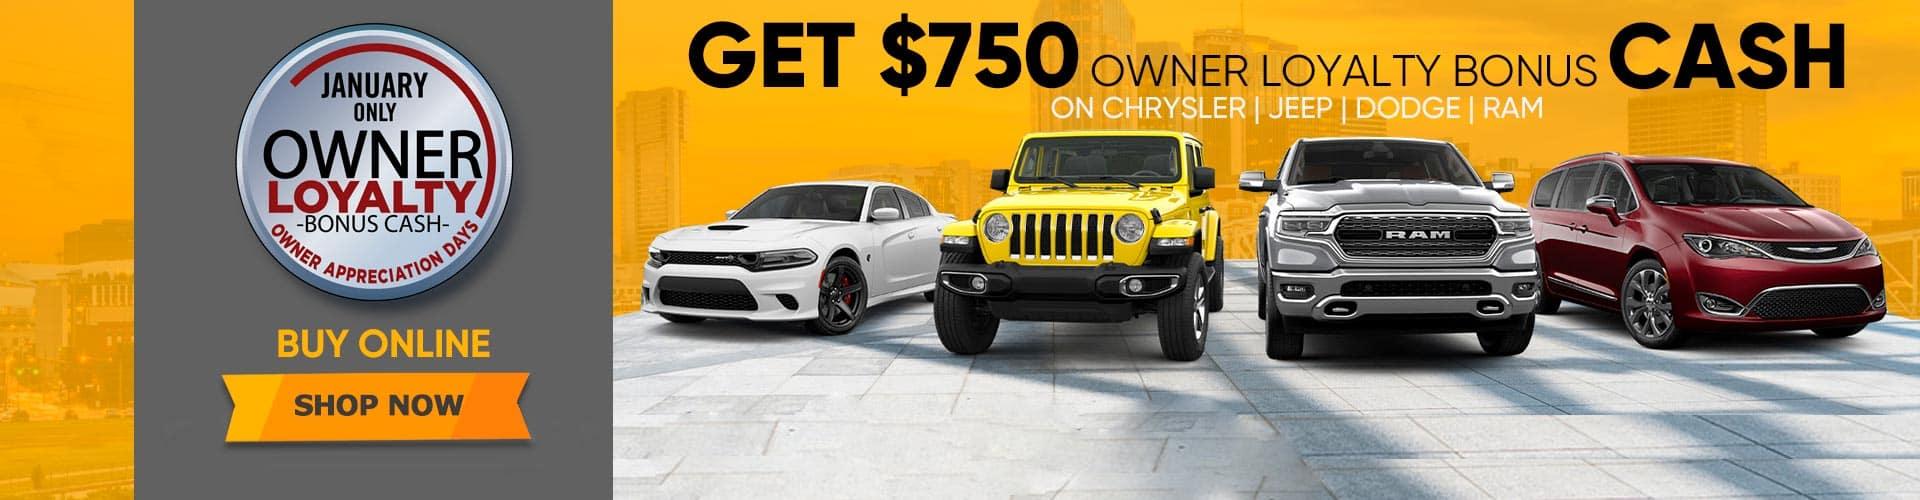 Chrysler Jeep Dodge Ram Owner Loyalty Bonus Cash